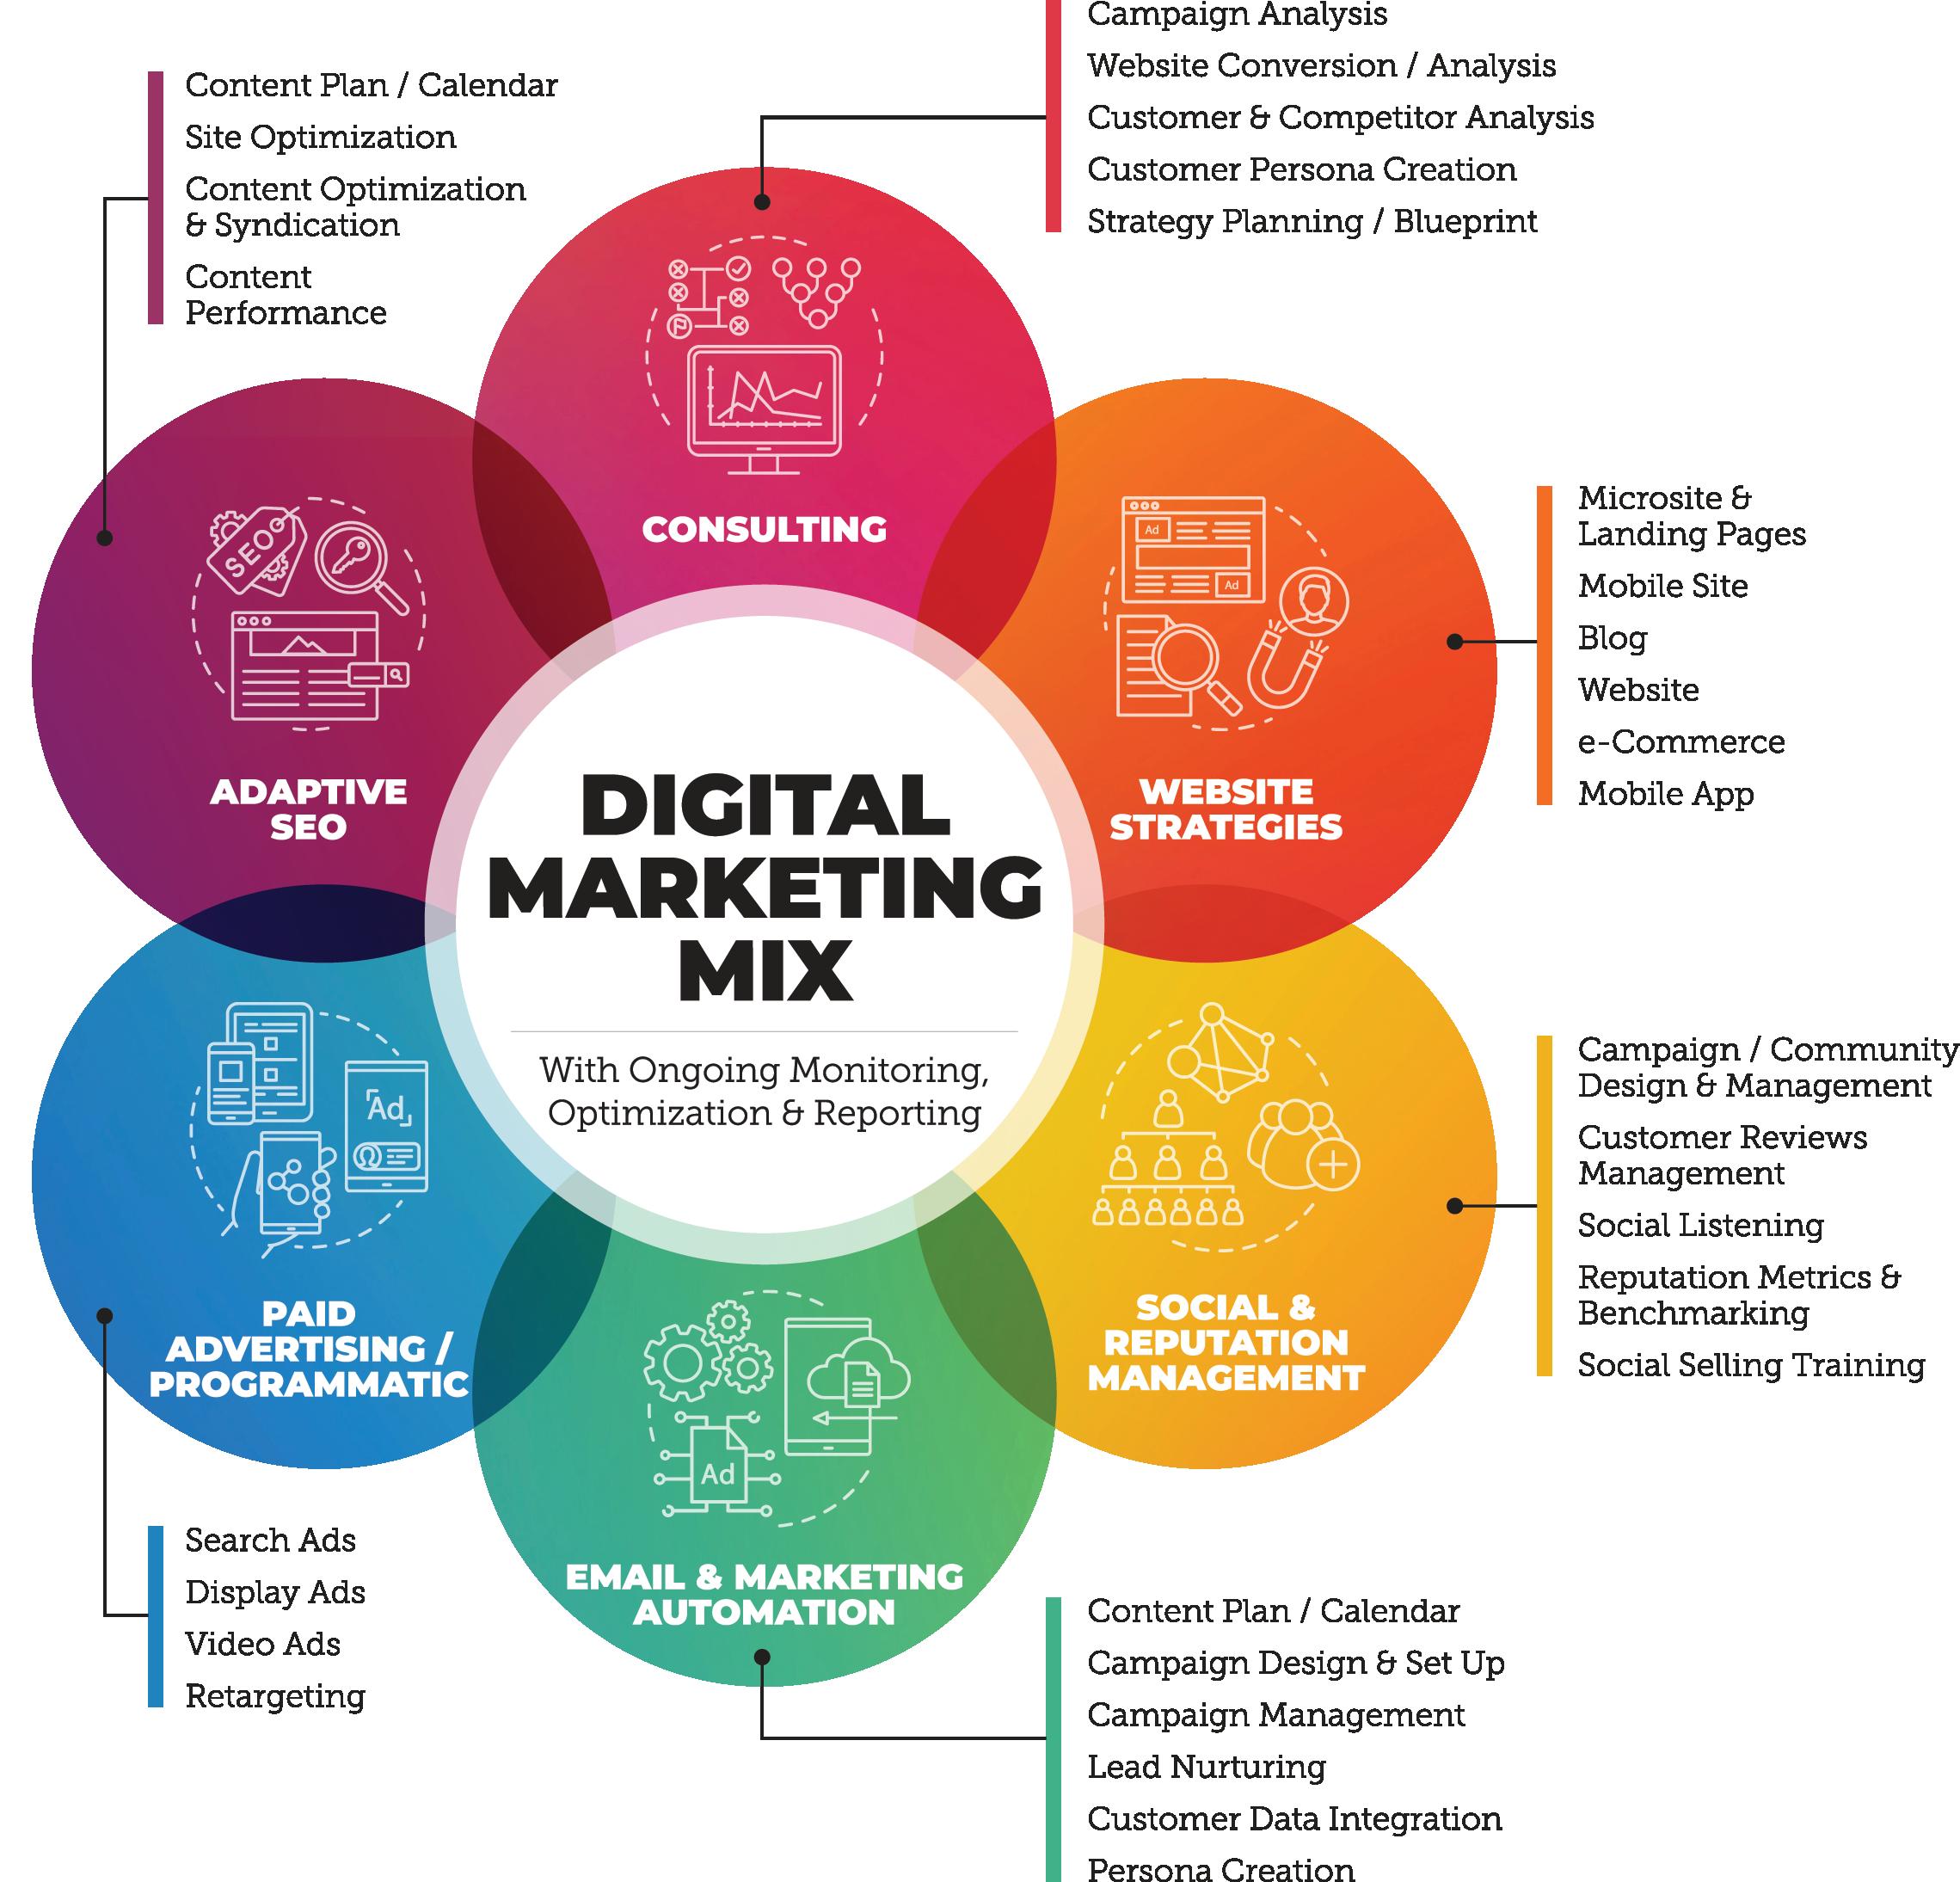 Digital Marketing Mix Infographic